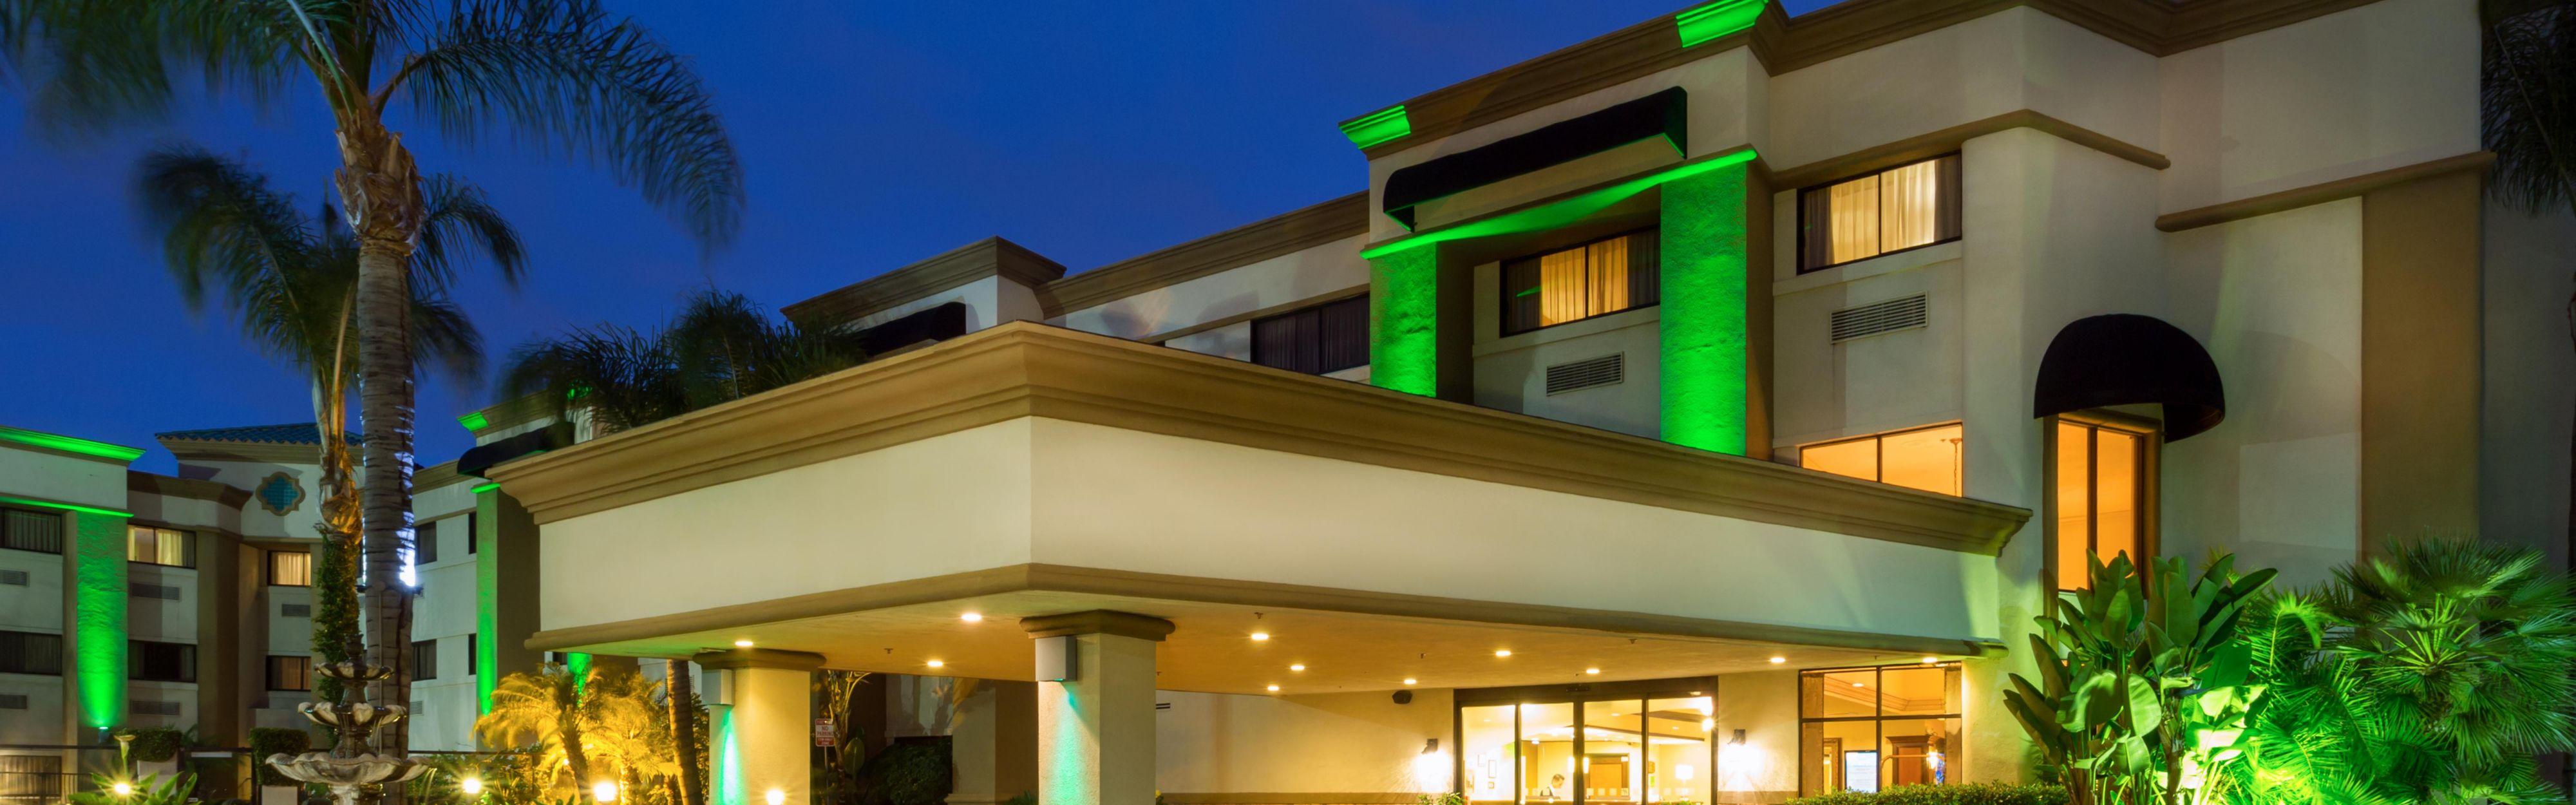 Holiday Inn Santa Ana-Orange Co. Arpt image 0